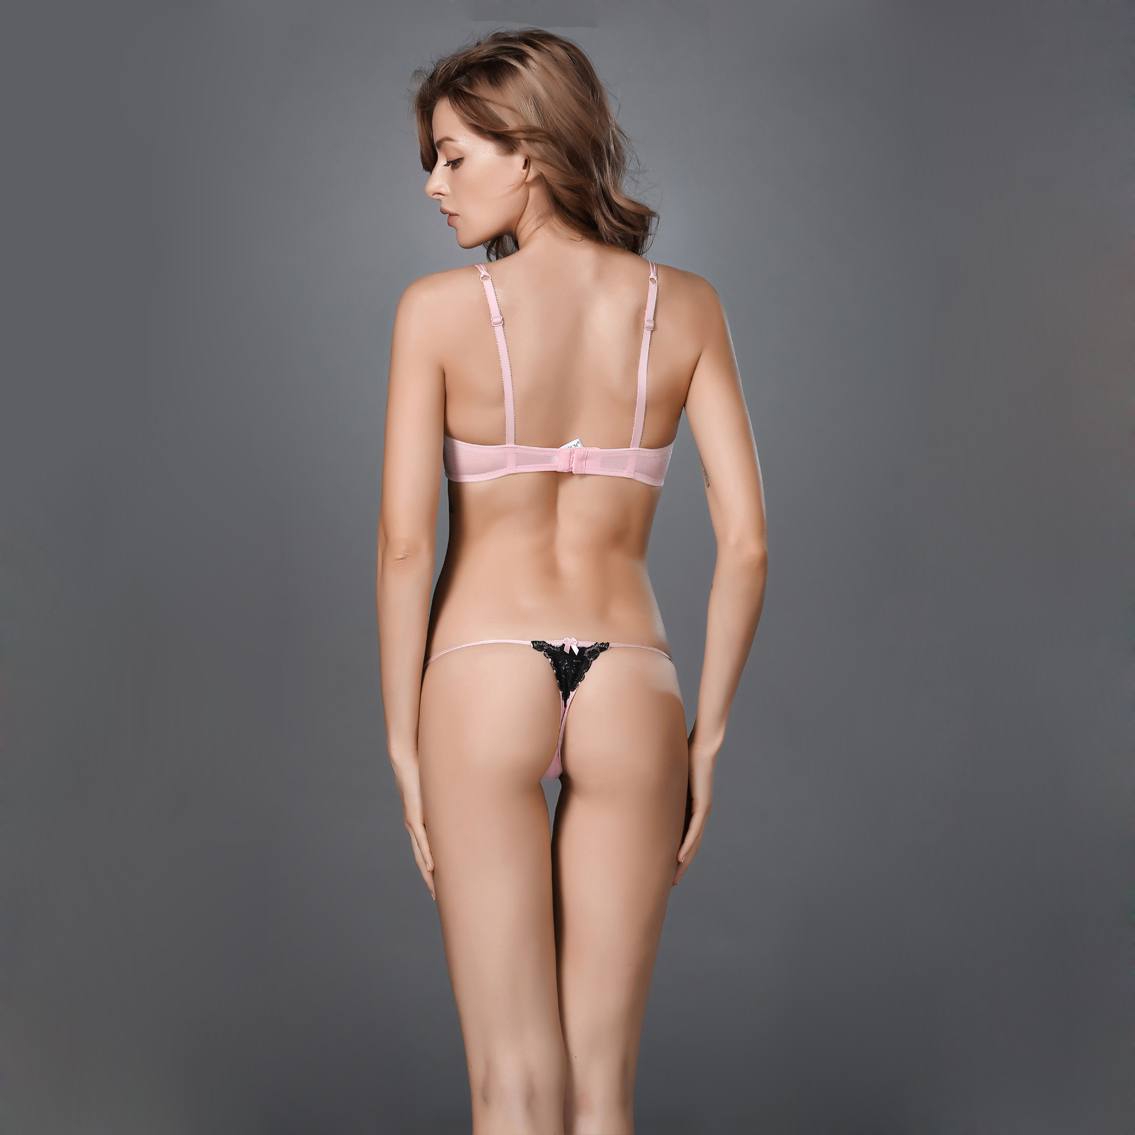 peach naked